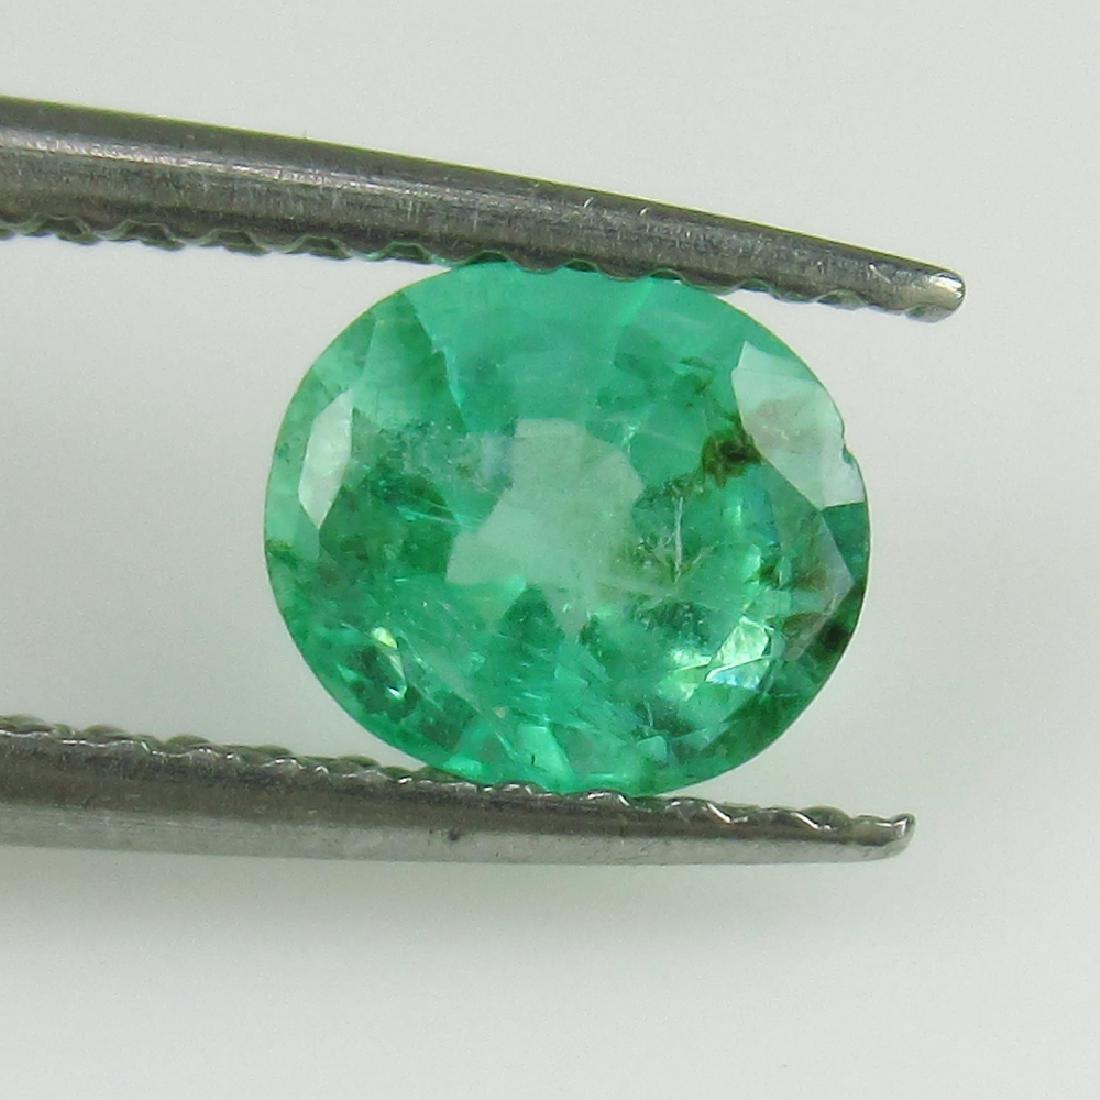 0.64 Ct Genuine Loose Zambian Emerald Nice Oval Cut